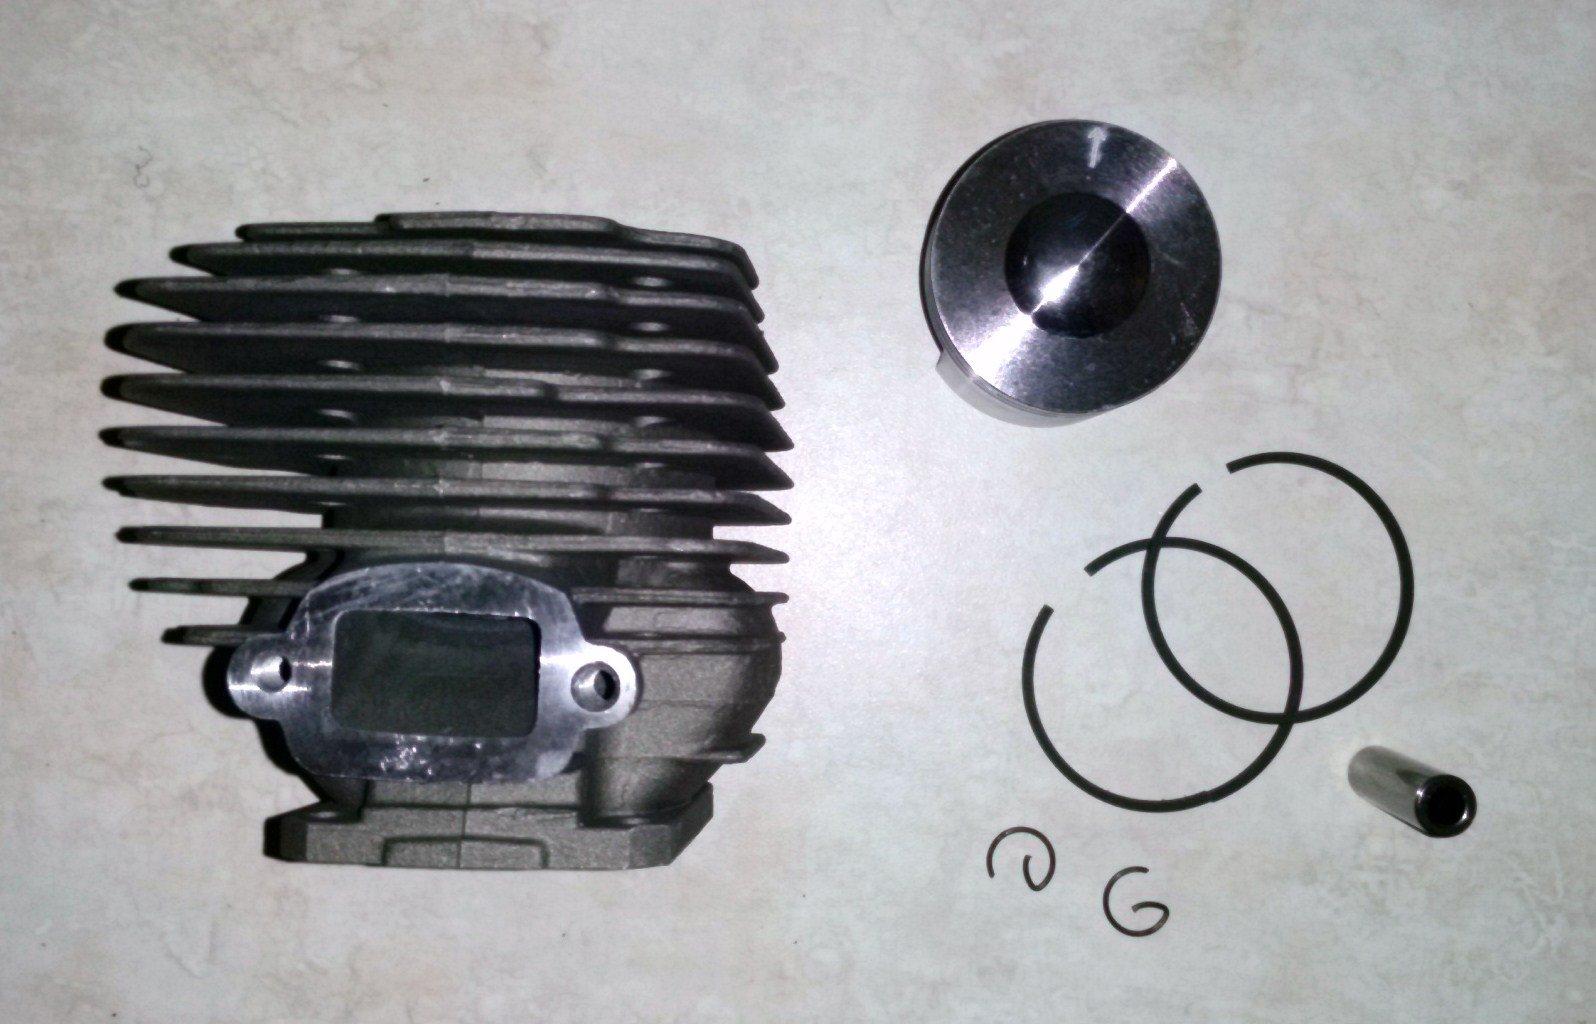 Cylinder 46mm Piston Kit for STIHL 028 028AV 028 Super Q W WB Replaces OEM# 1118 020 1203 / 11180201203